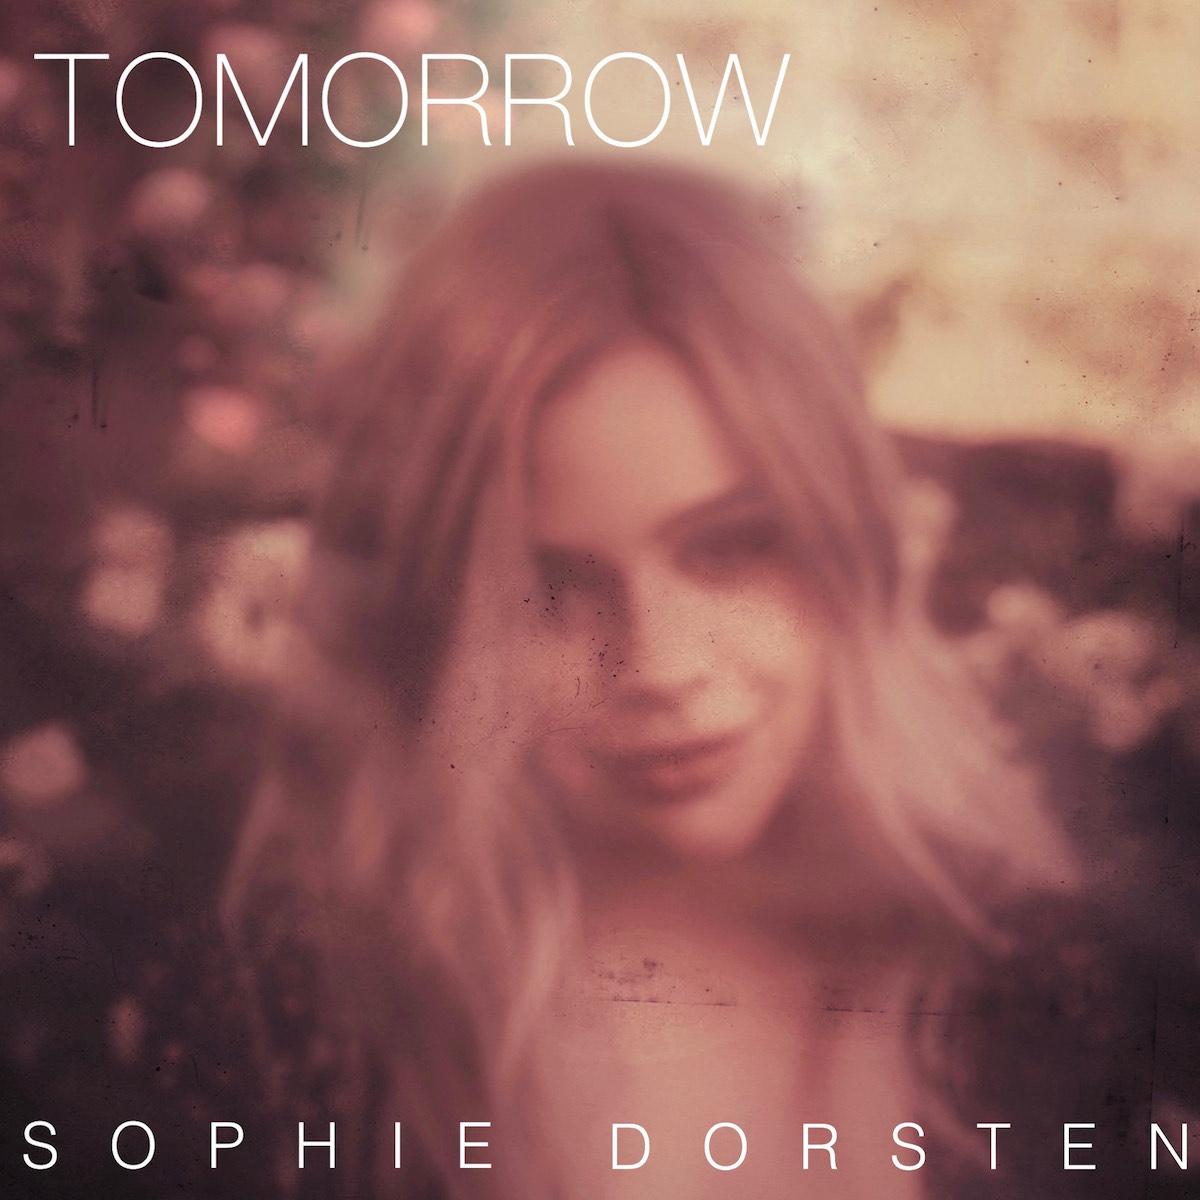 Sophie Dorsten